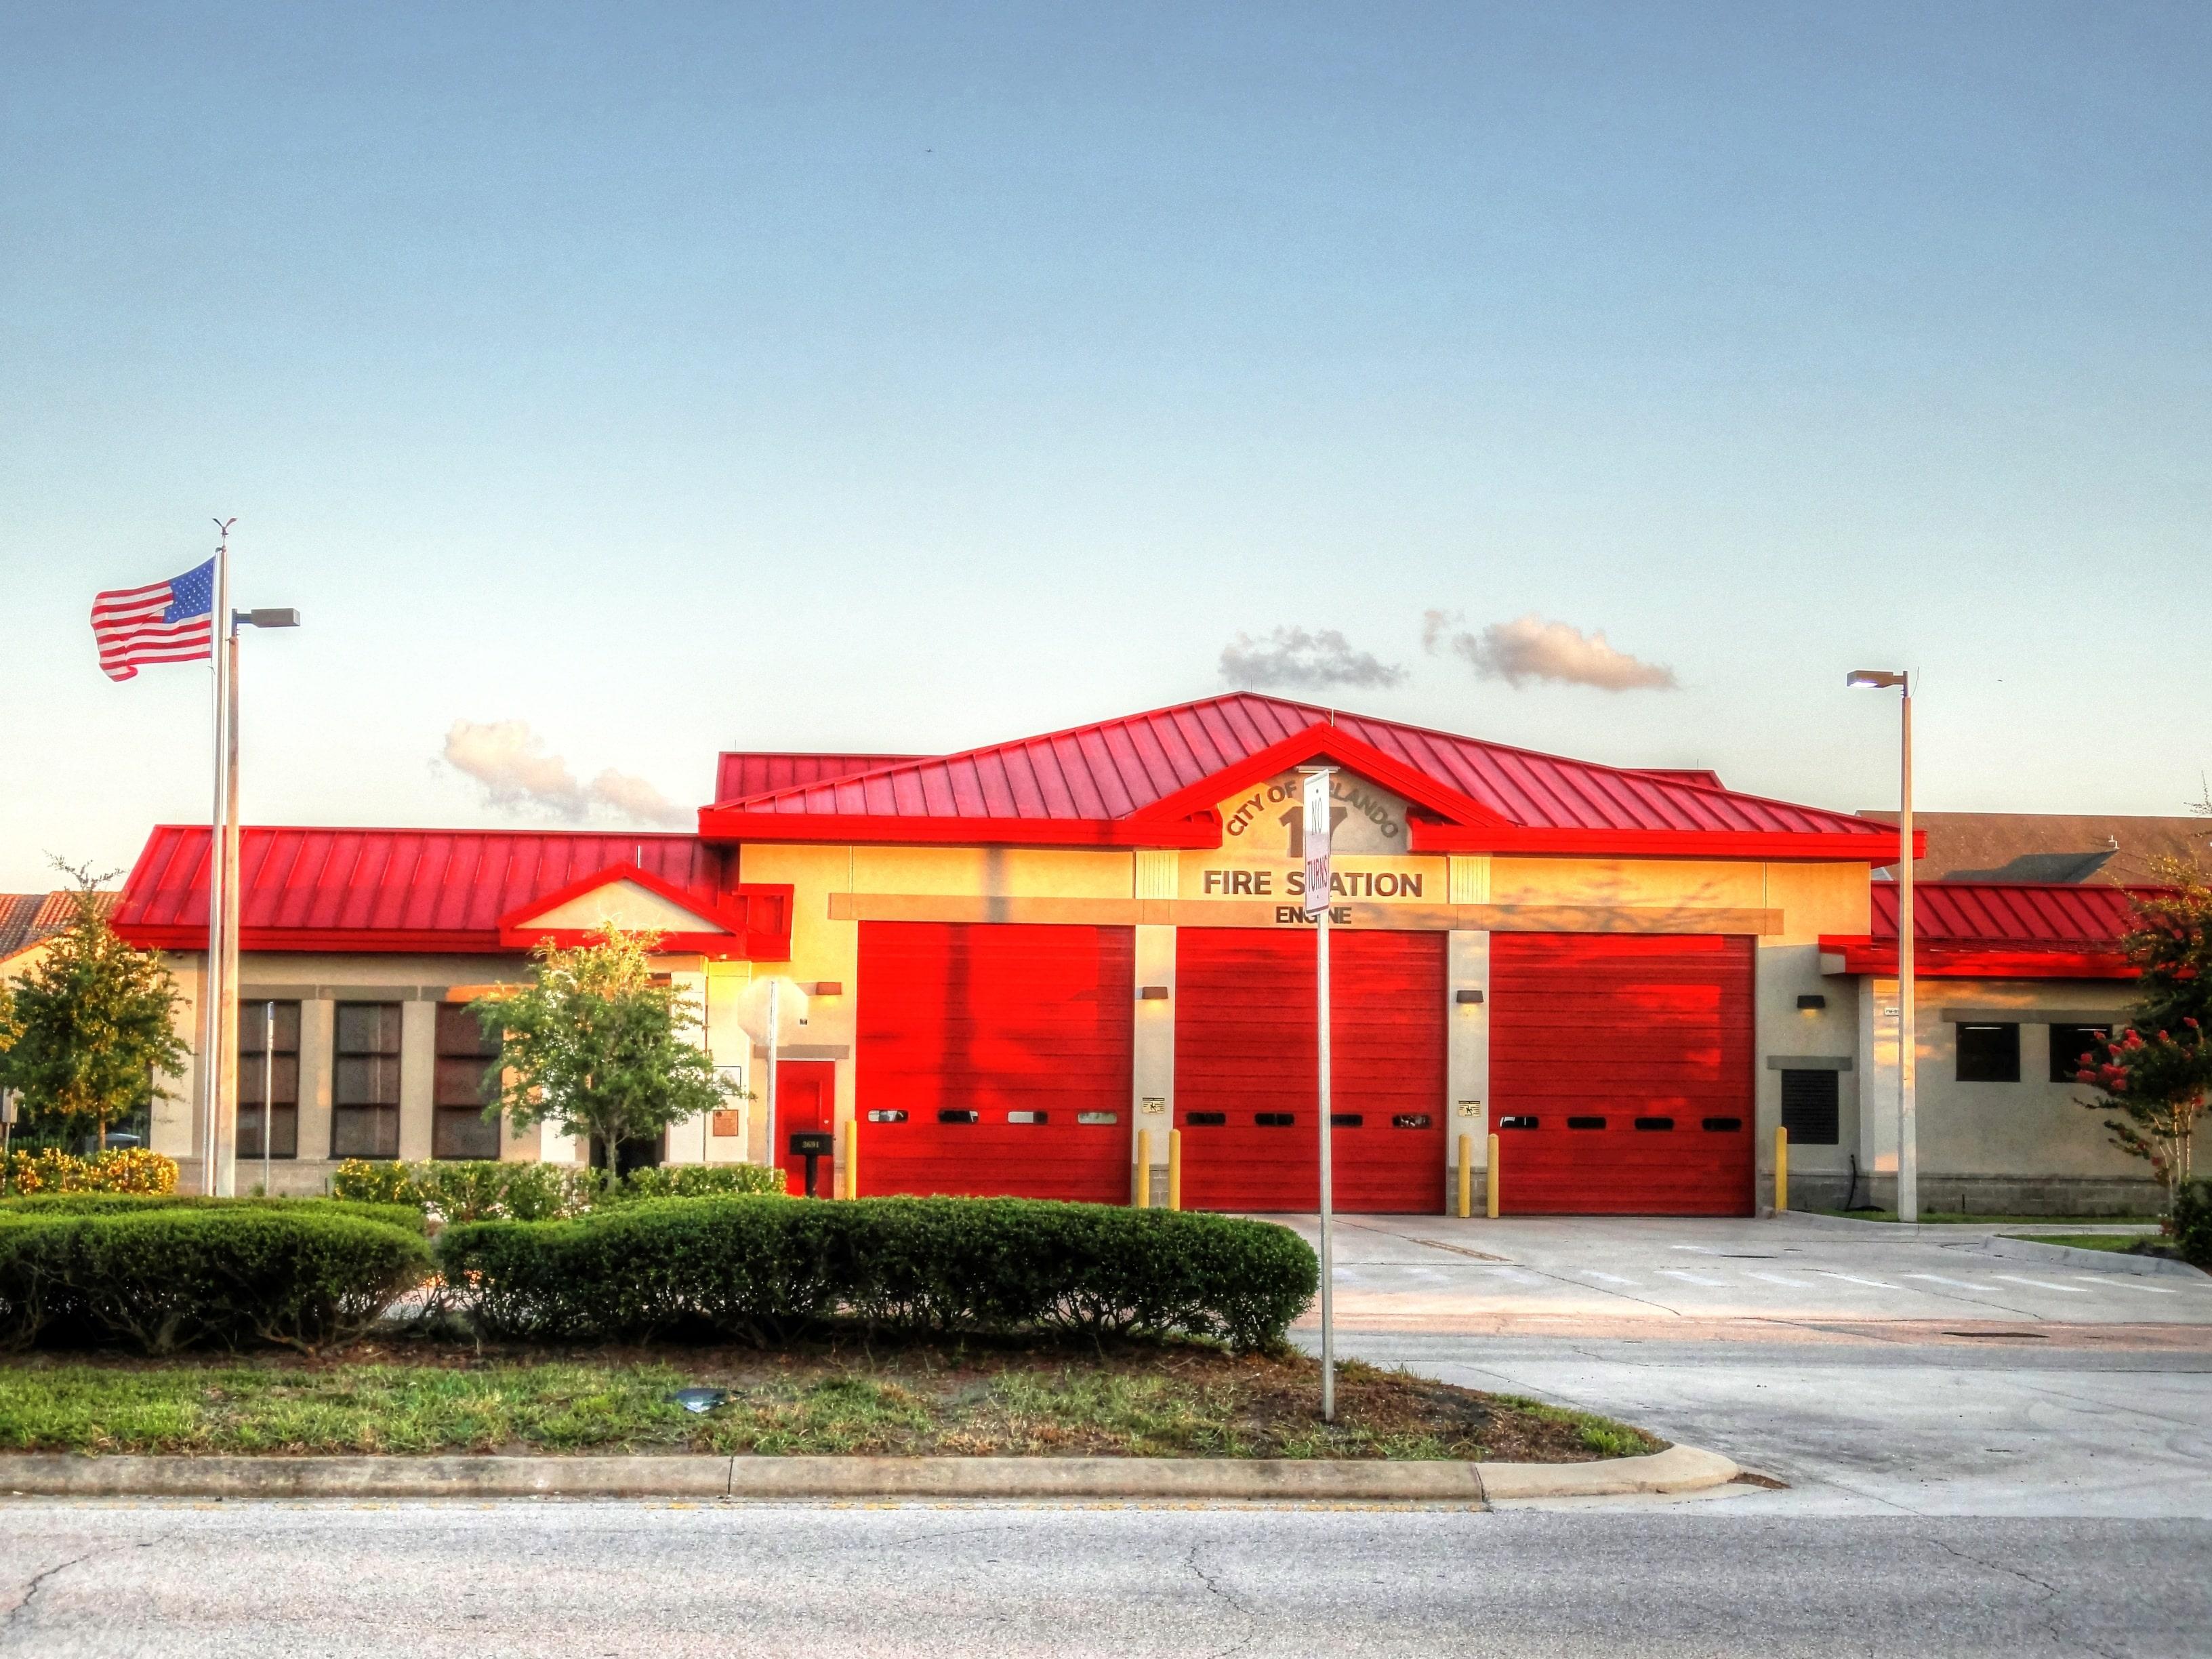 Fire station, fire department